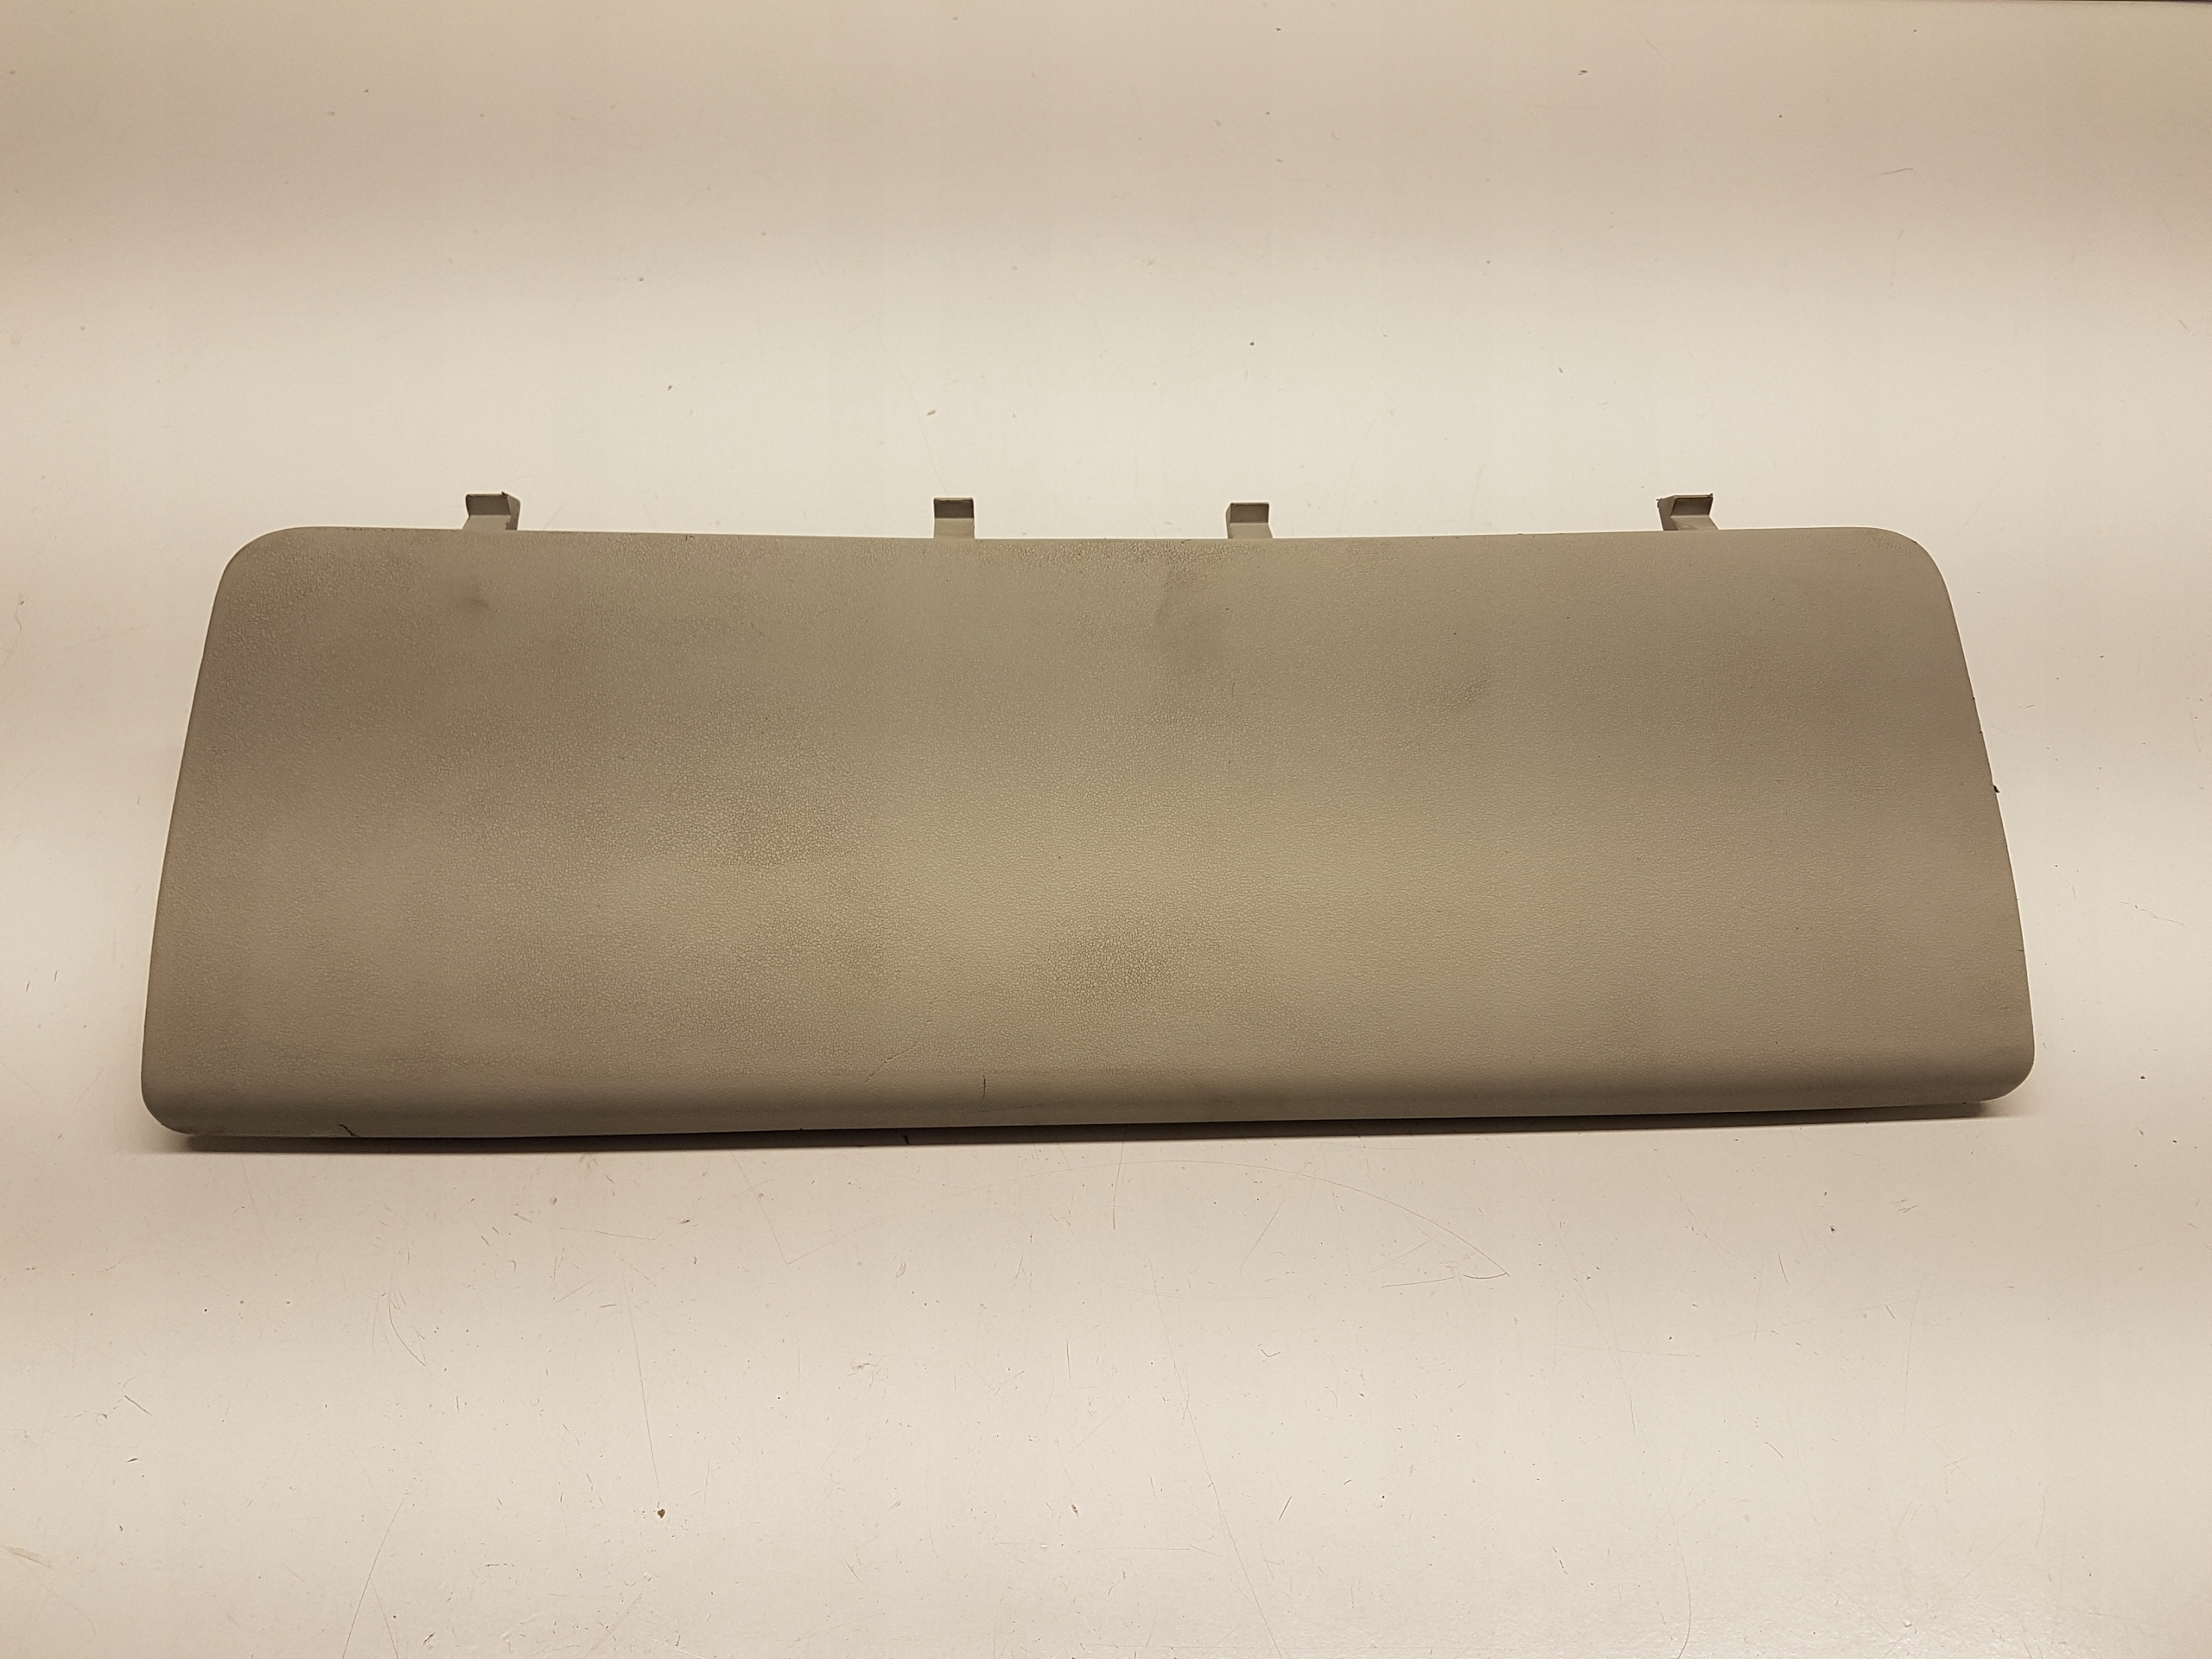 r-r evoque подушка коленная airbag оригинал